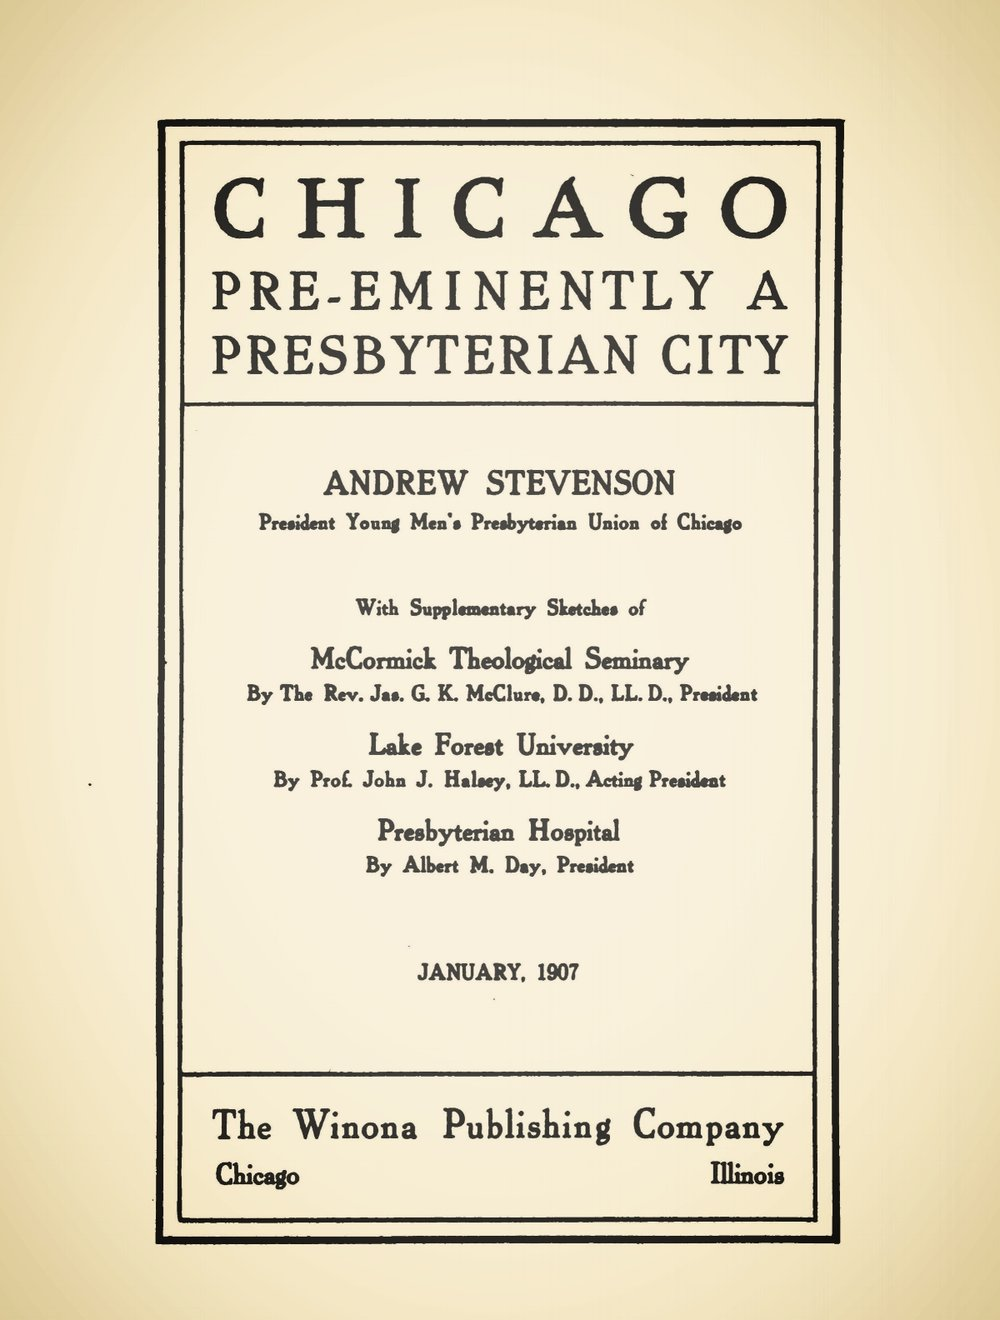 Stevenson, Andrew, Chicago Pre-Eminently a Presbyterian City Title Page.jpg